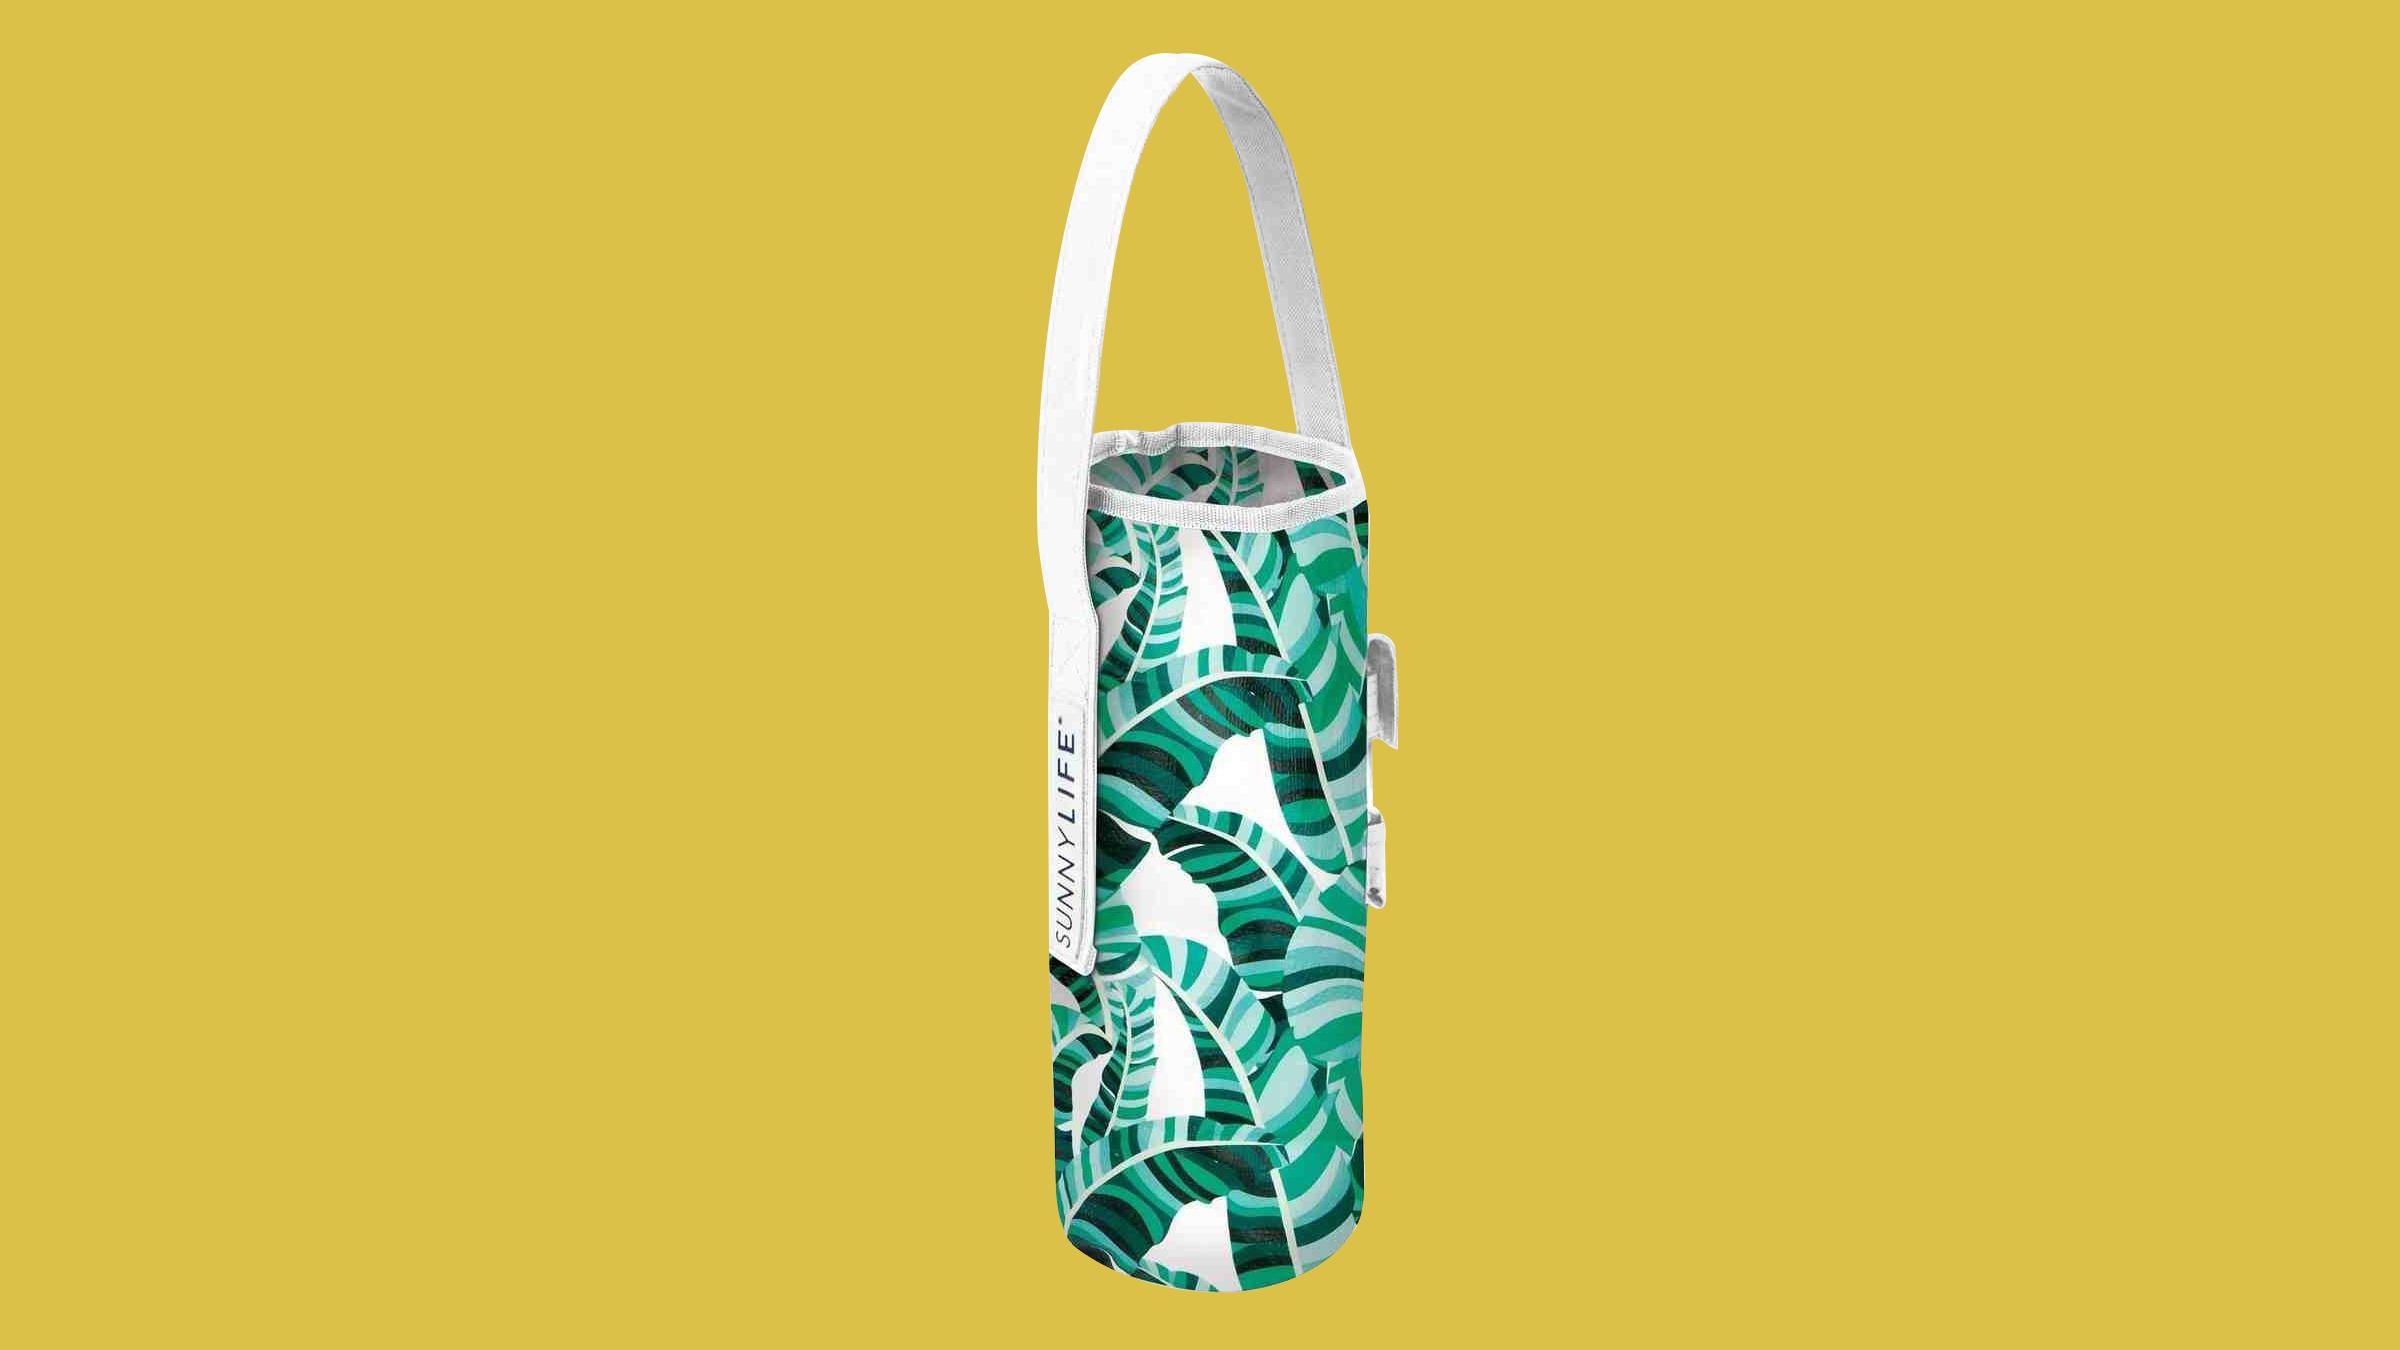 sunny life bottle cooler tote